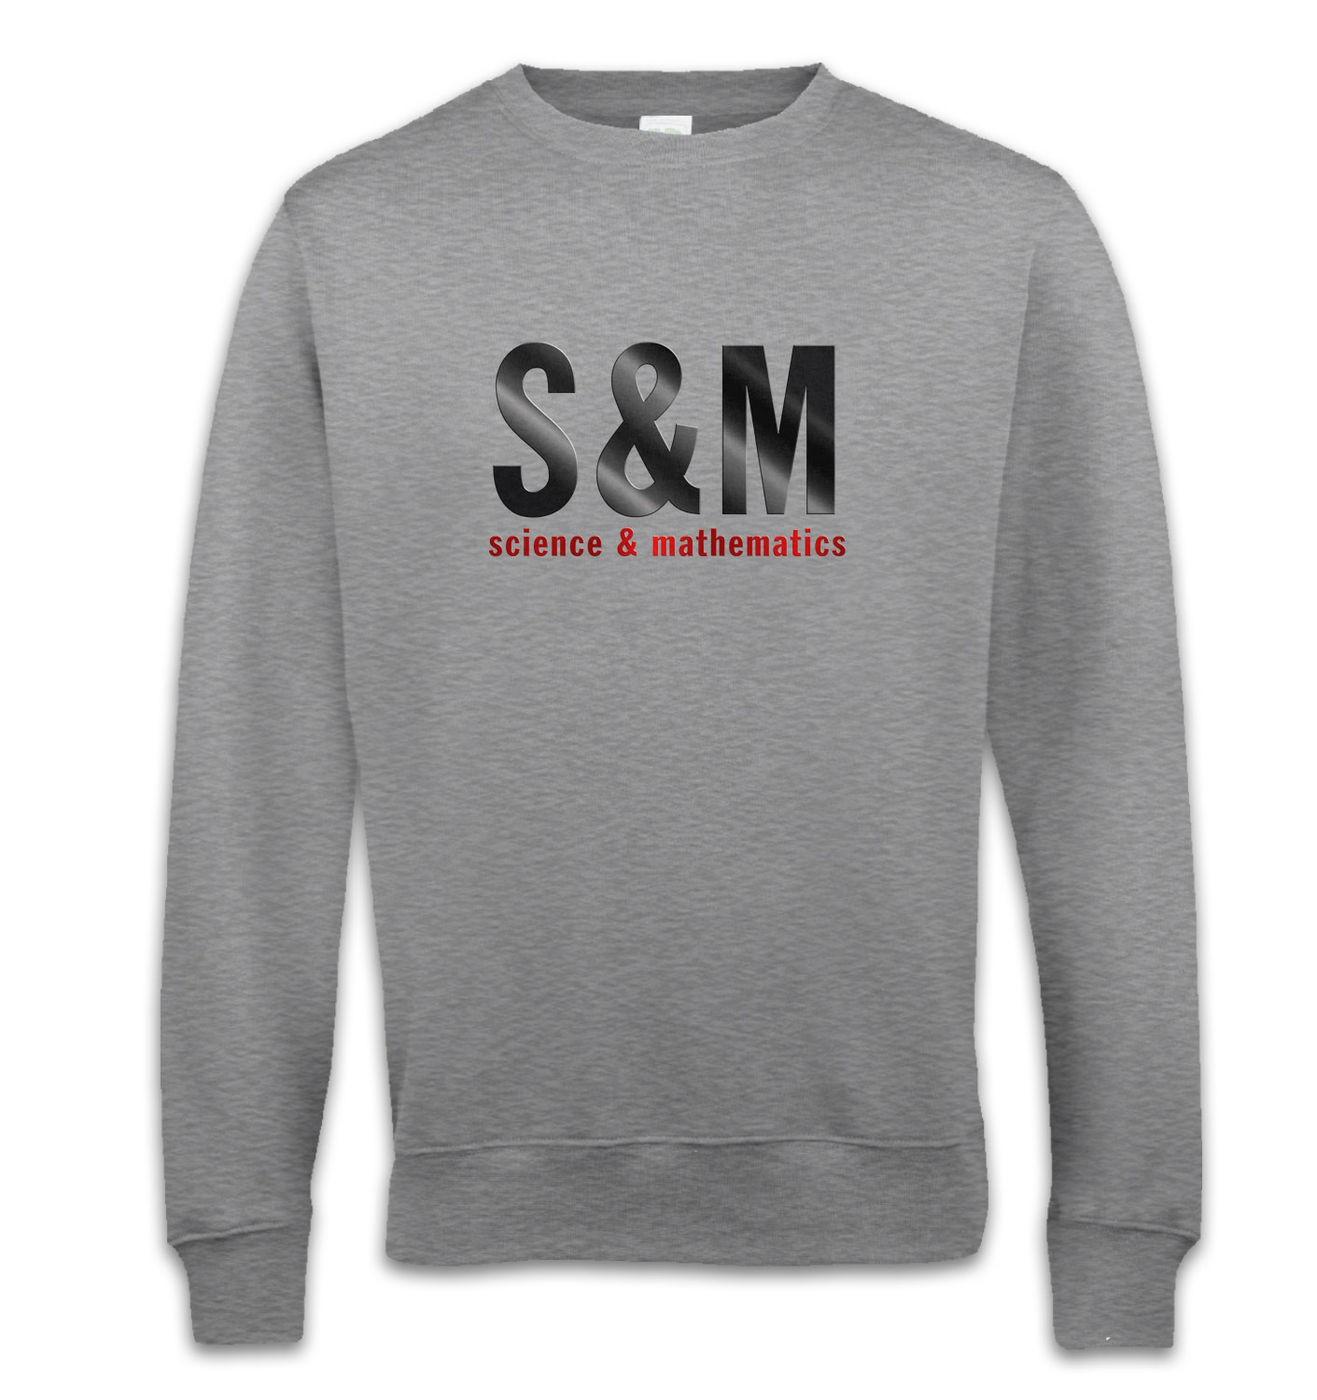 S & M sweatshirt - funny science & mathematics sweatshirt